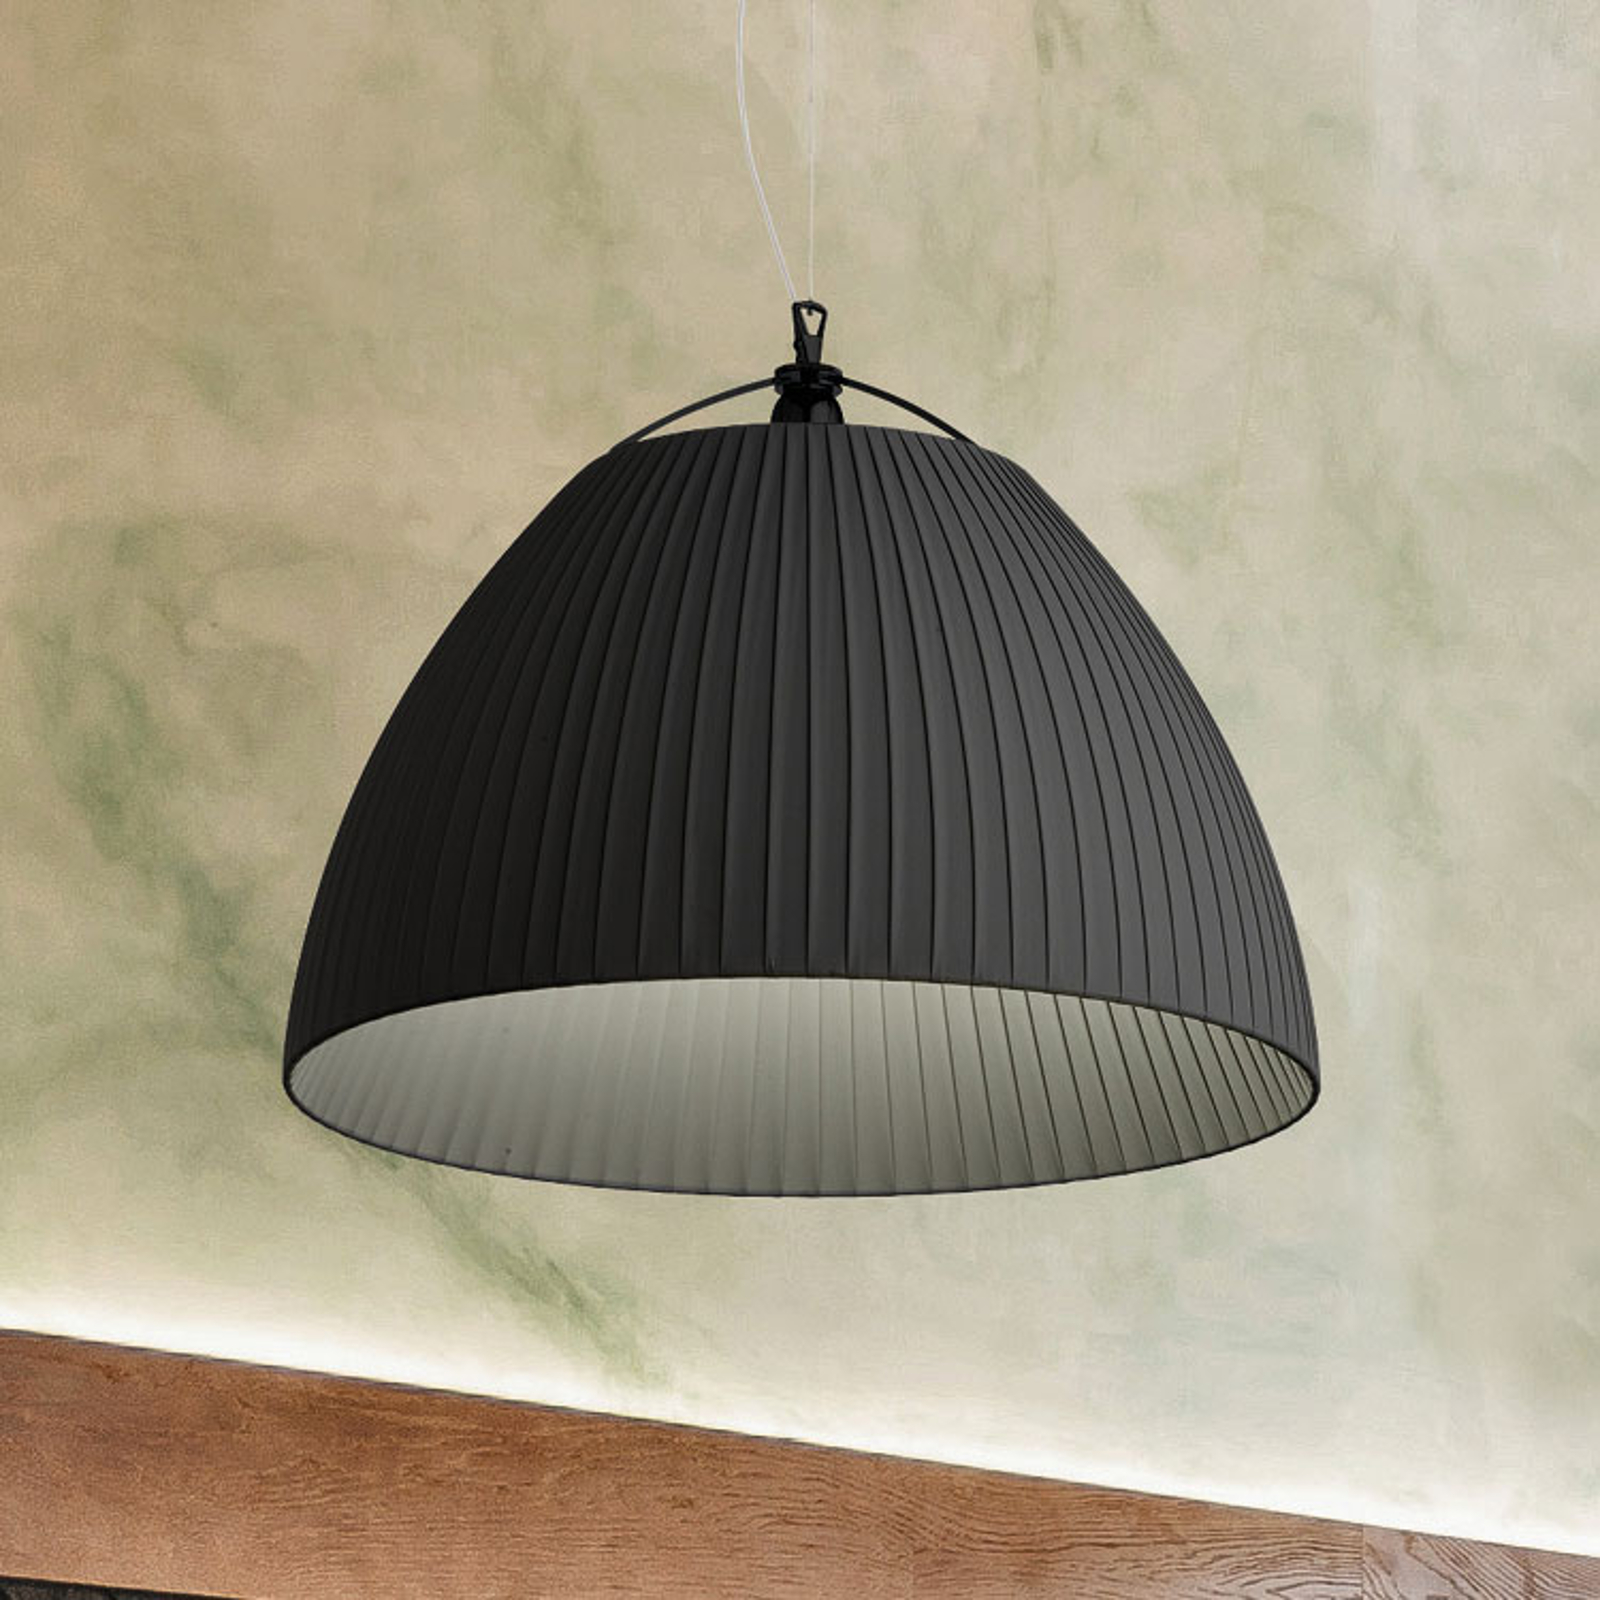 Modo Luce Olivia lampa wisząca Ø 42 cm czarna